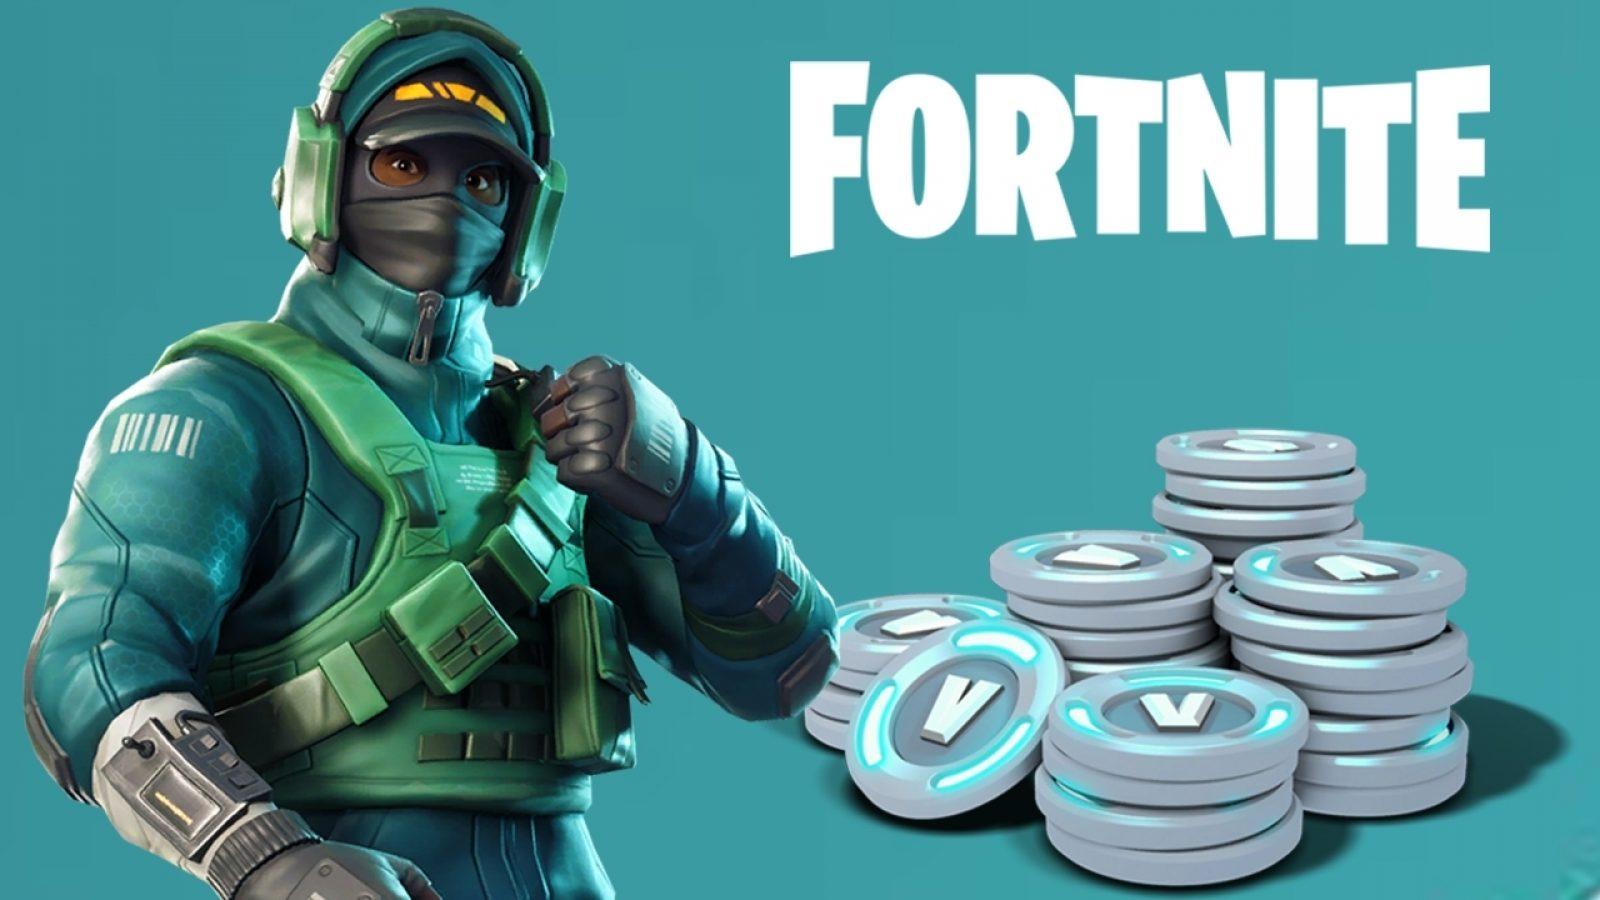 Fortnite NVIDIA GeForce Bundle